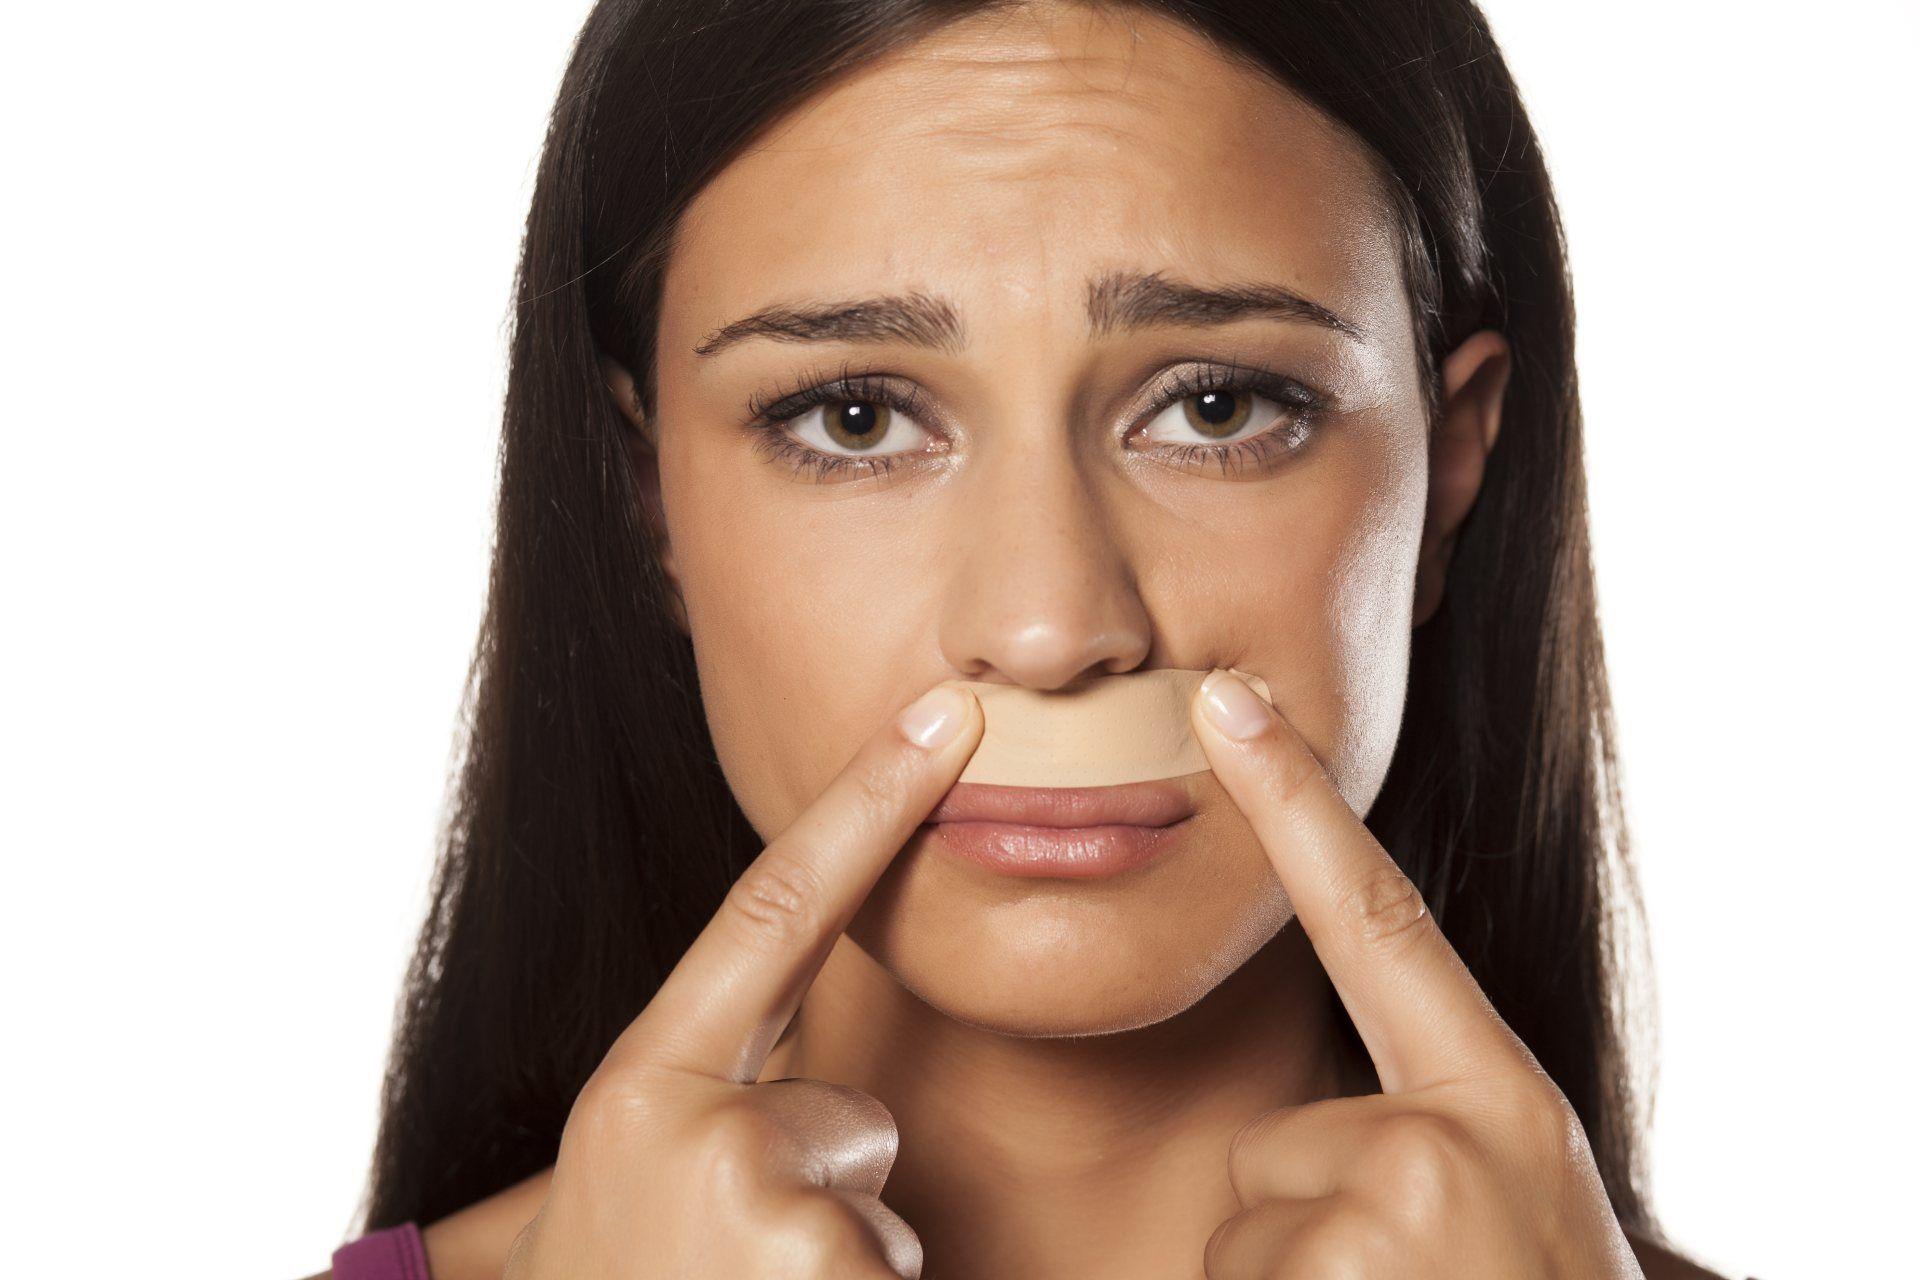 Гирсутизм и гипертрихоз у женщин